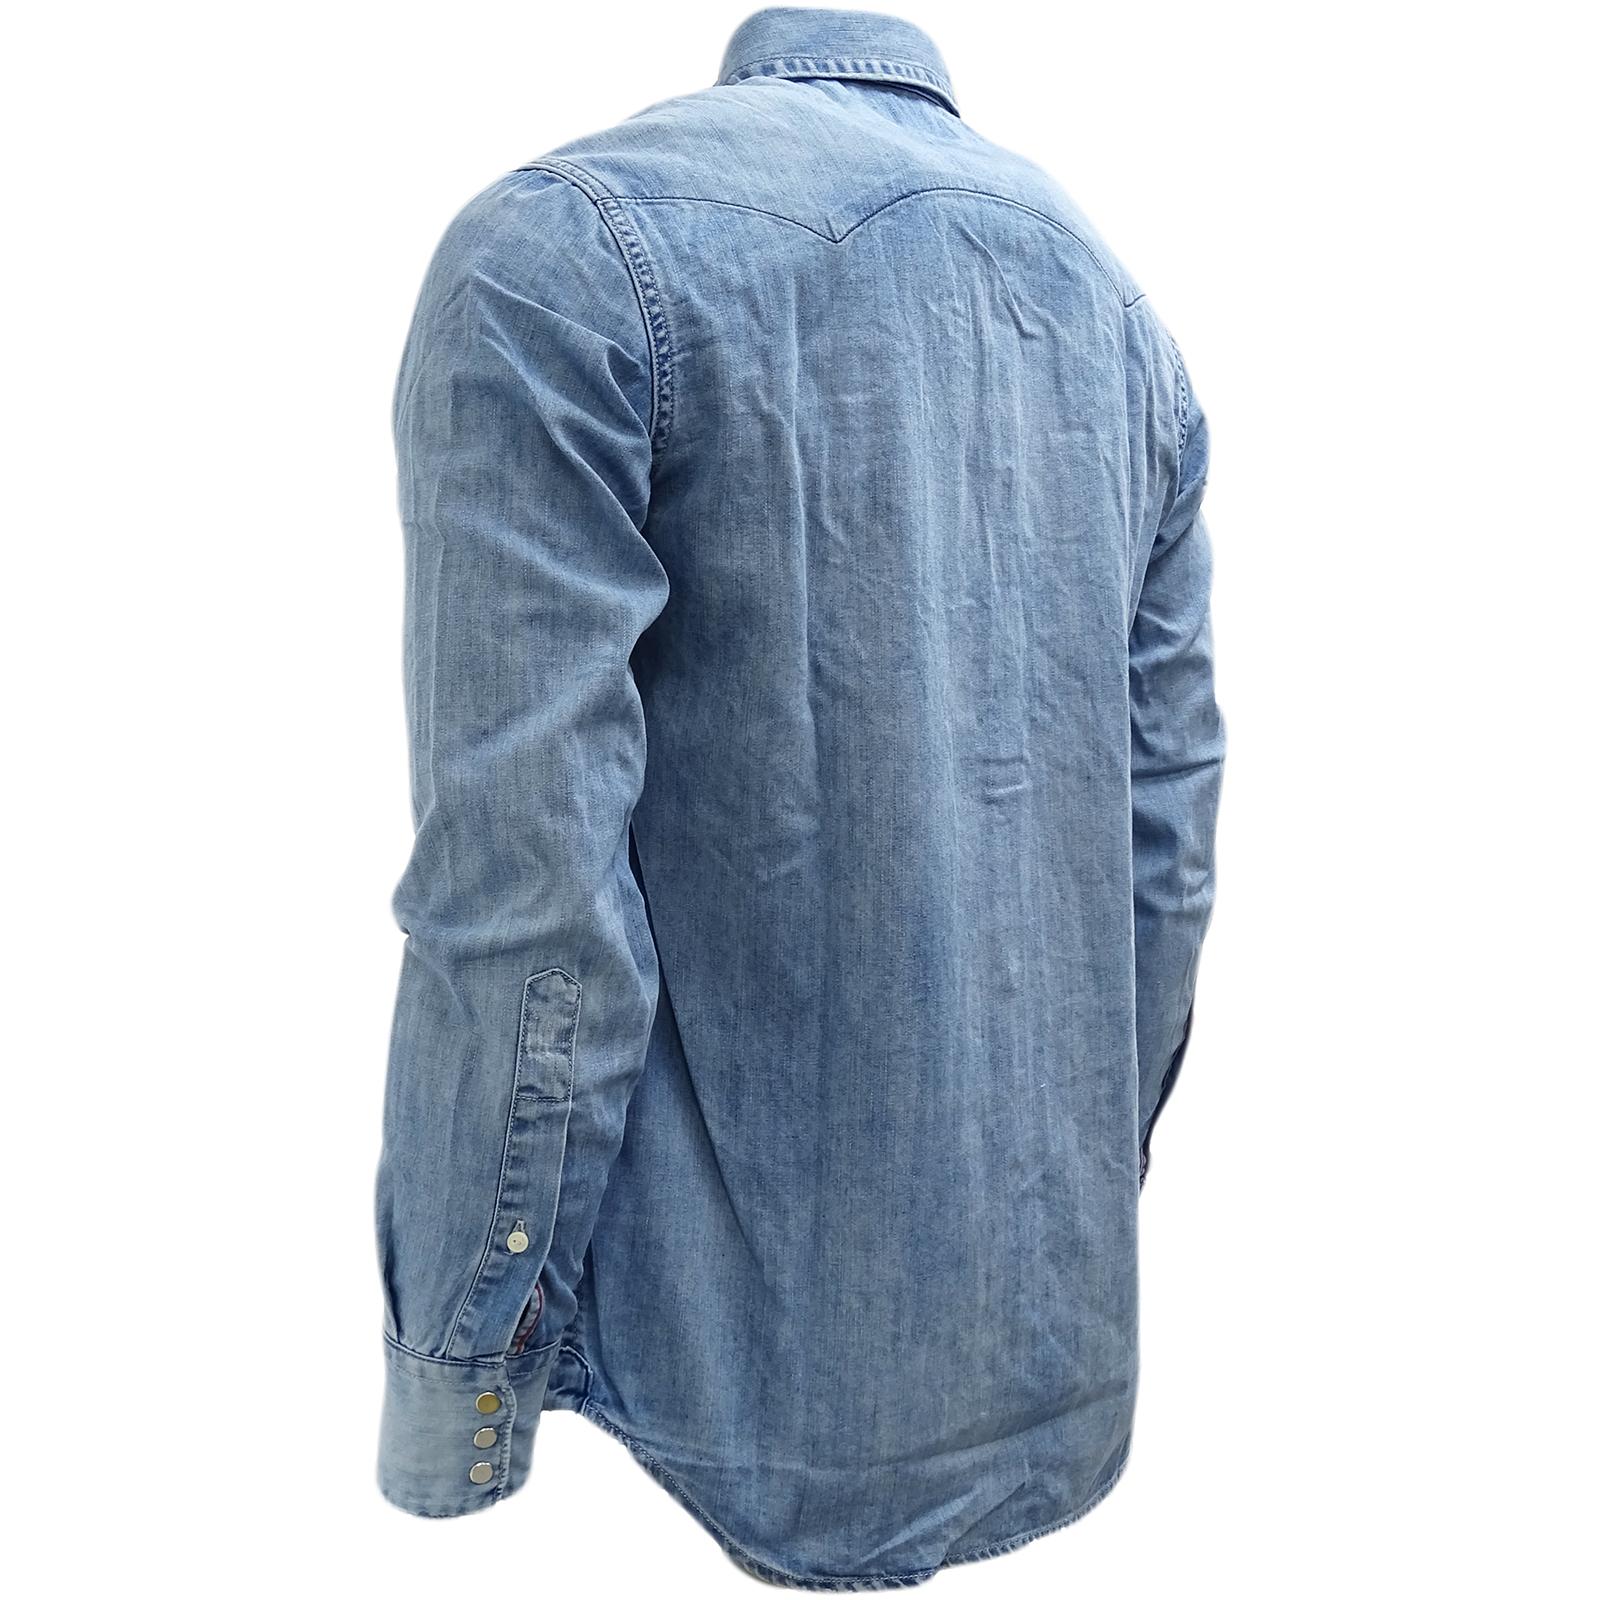 b6d9f4c217c Sentinel Replay Light Blue Western Style Denim Shirt - M4981-010